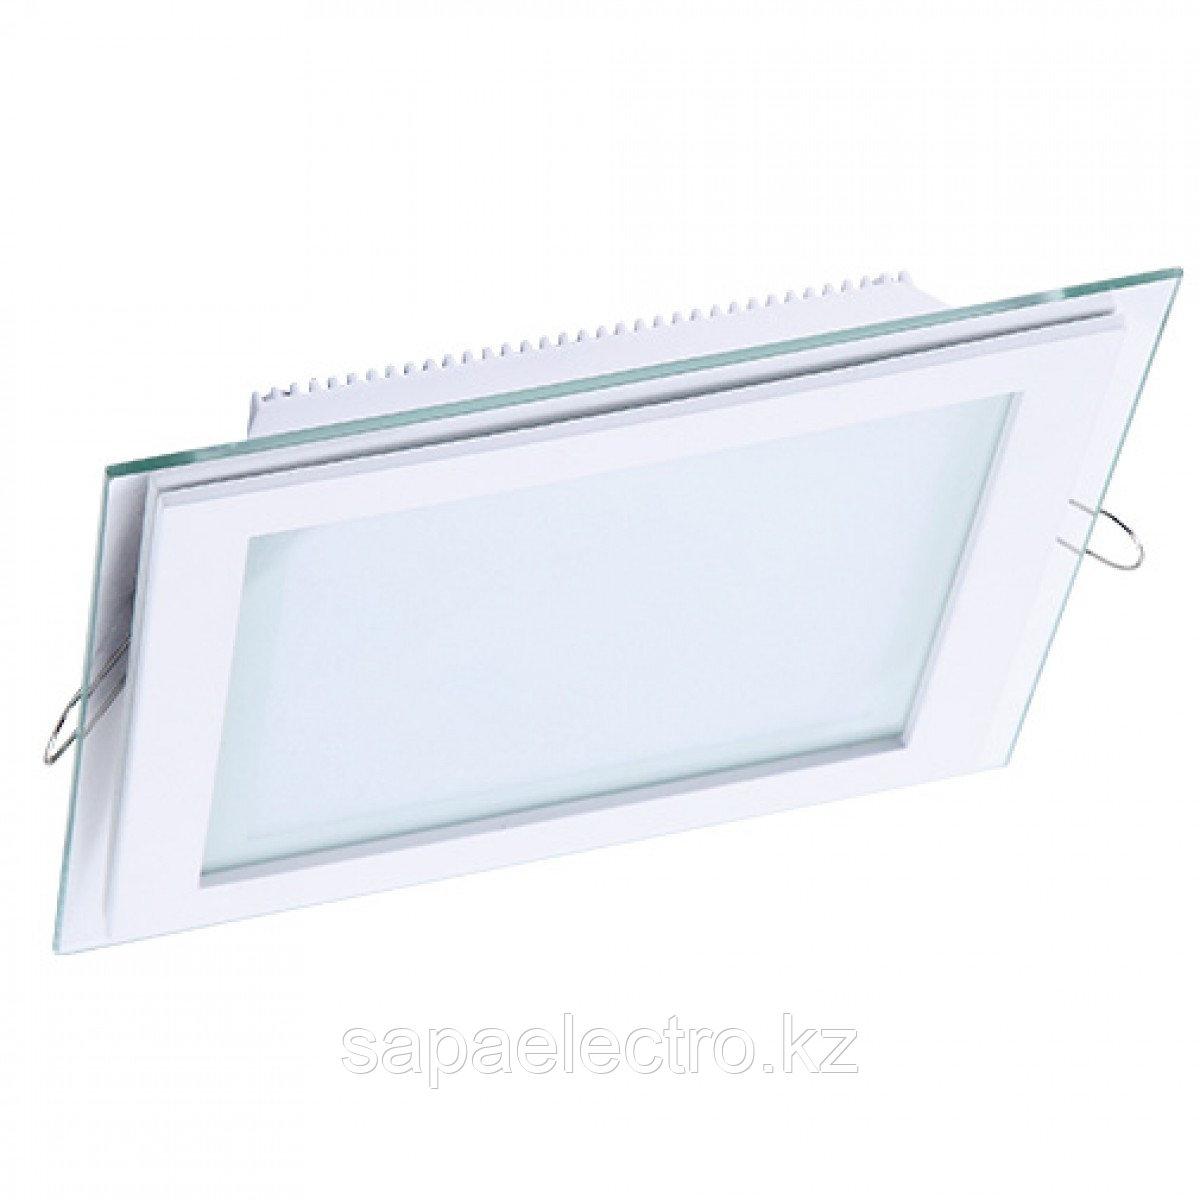 Свет-к DL LED GLASS KVADRO PANEL 18W 3000K(TS)20шт,